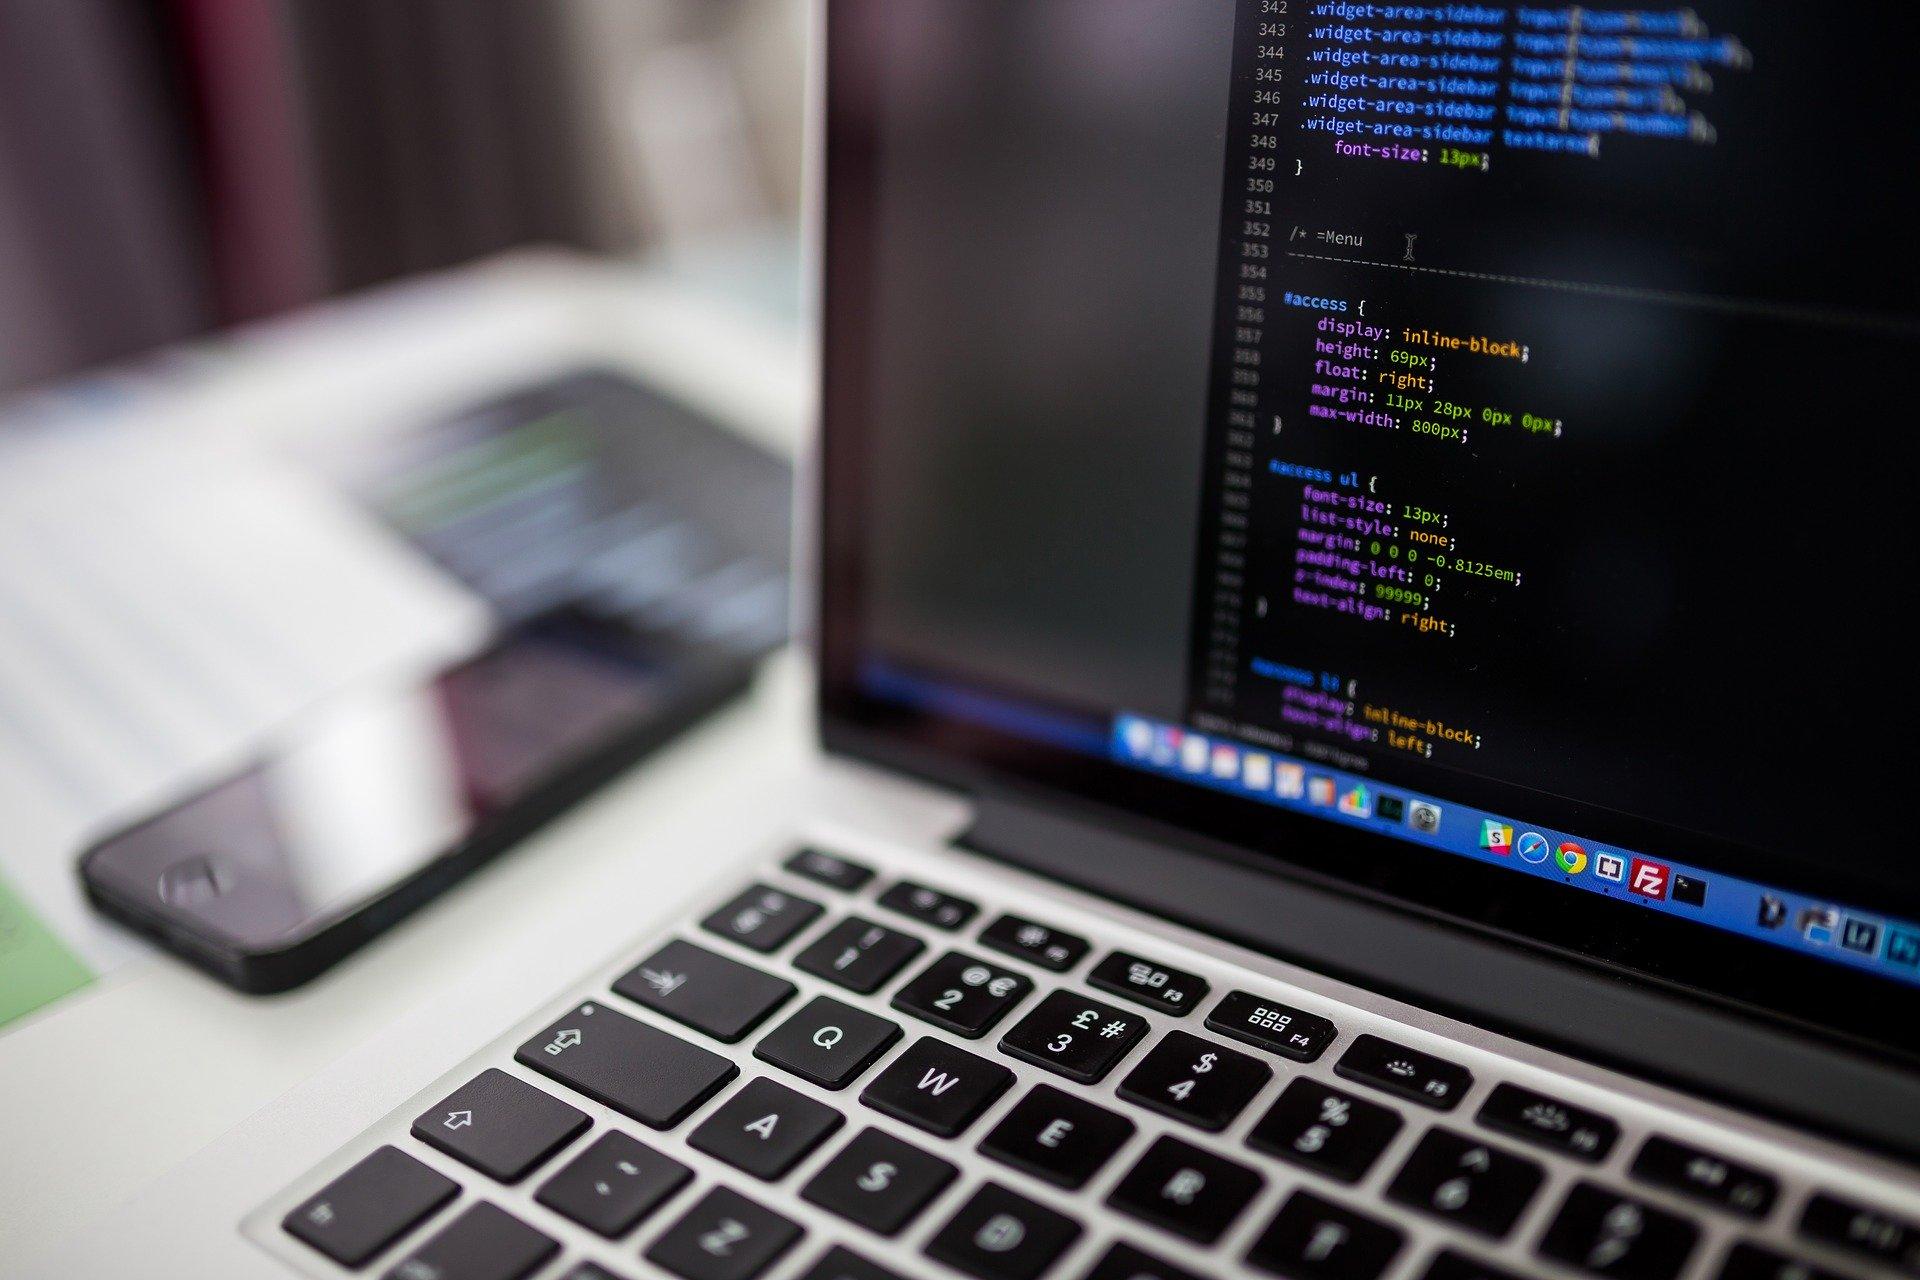 développement web alternance yvelines